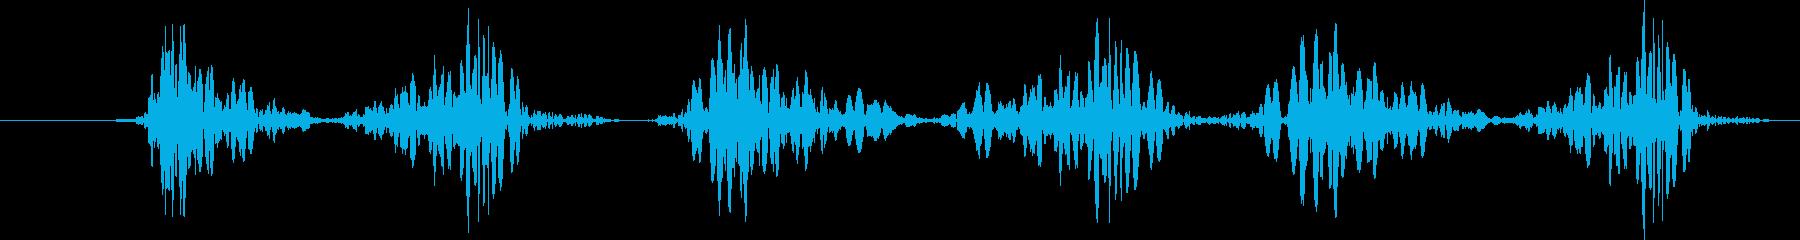 Djドラムスクラッチ、ショート、ス...の再生済みの波形